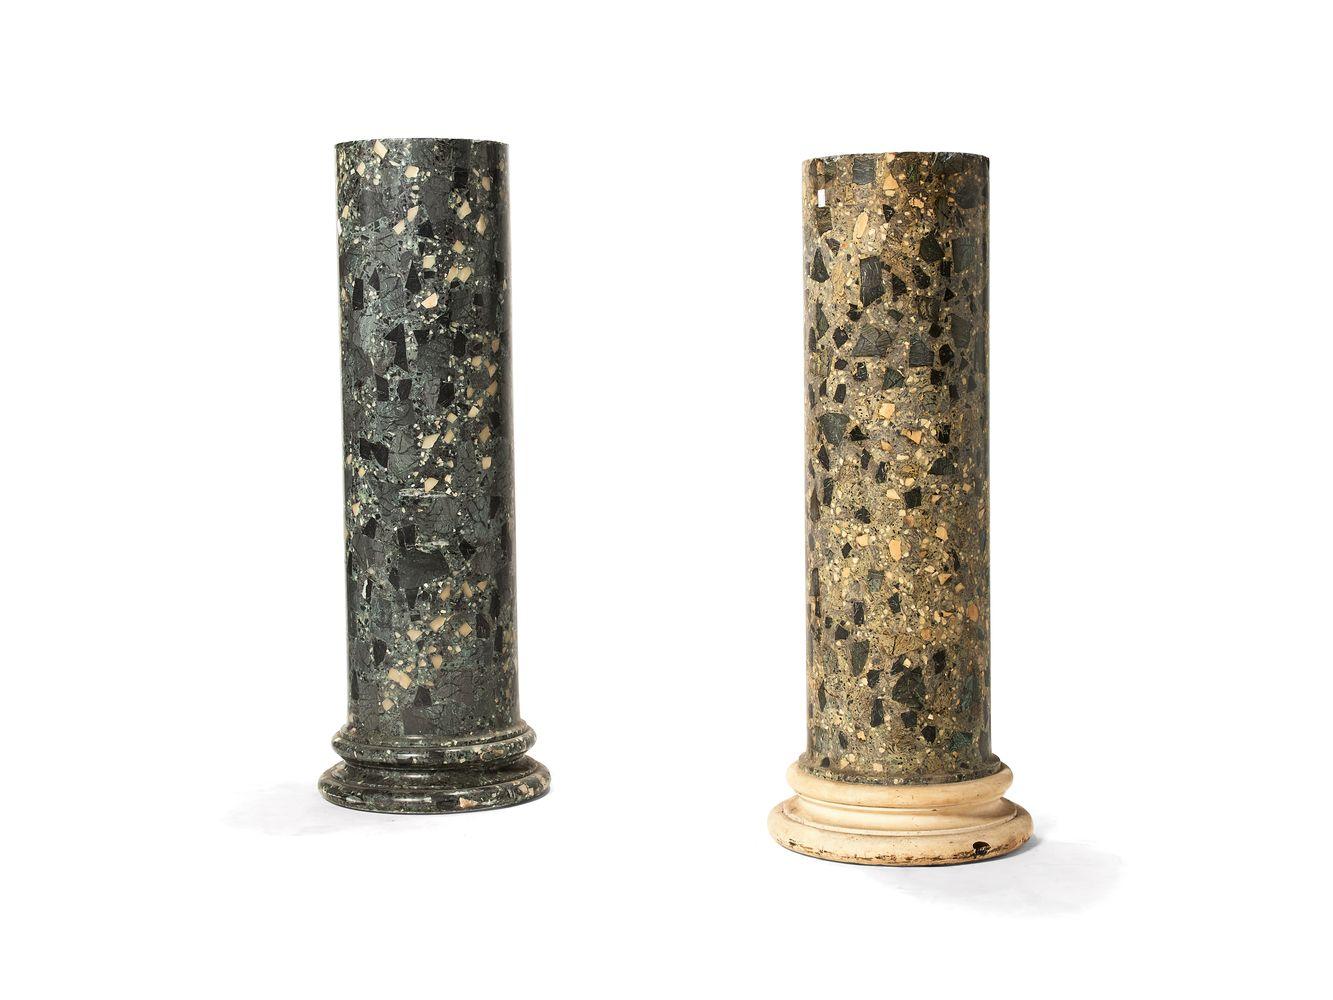 A scagliola columnar pedestal simulating verde antico, 19th century